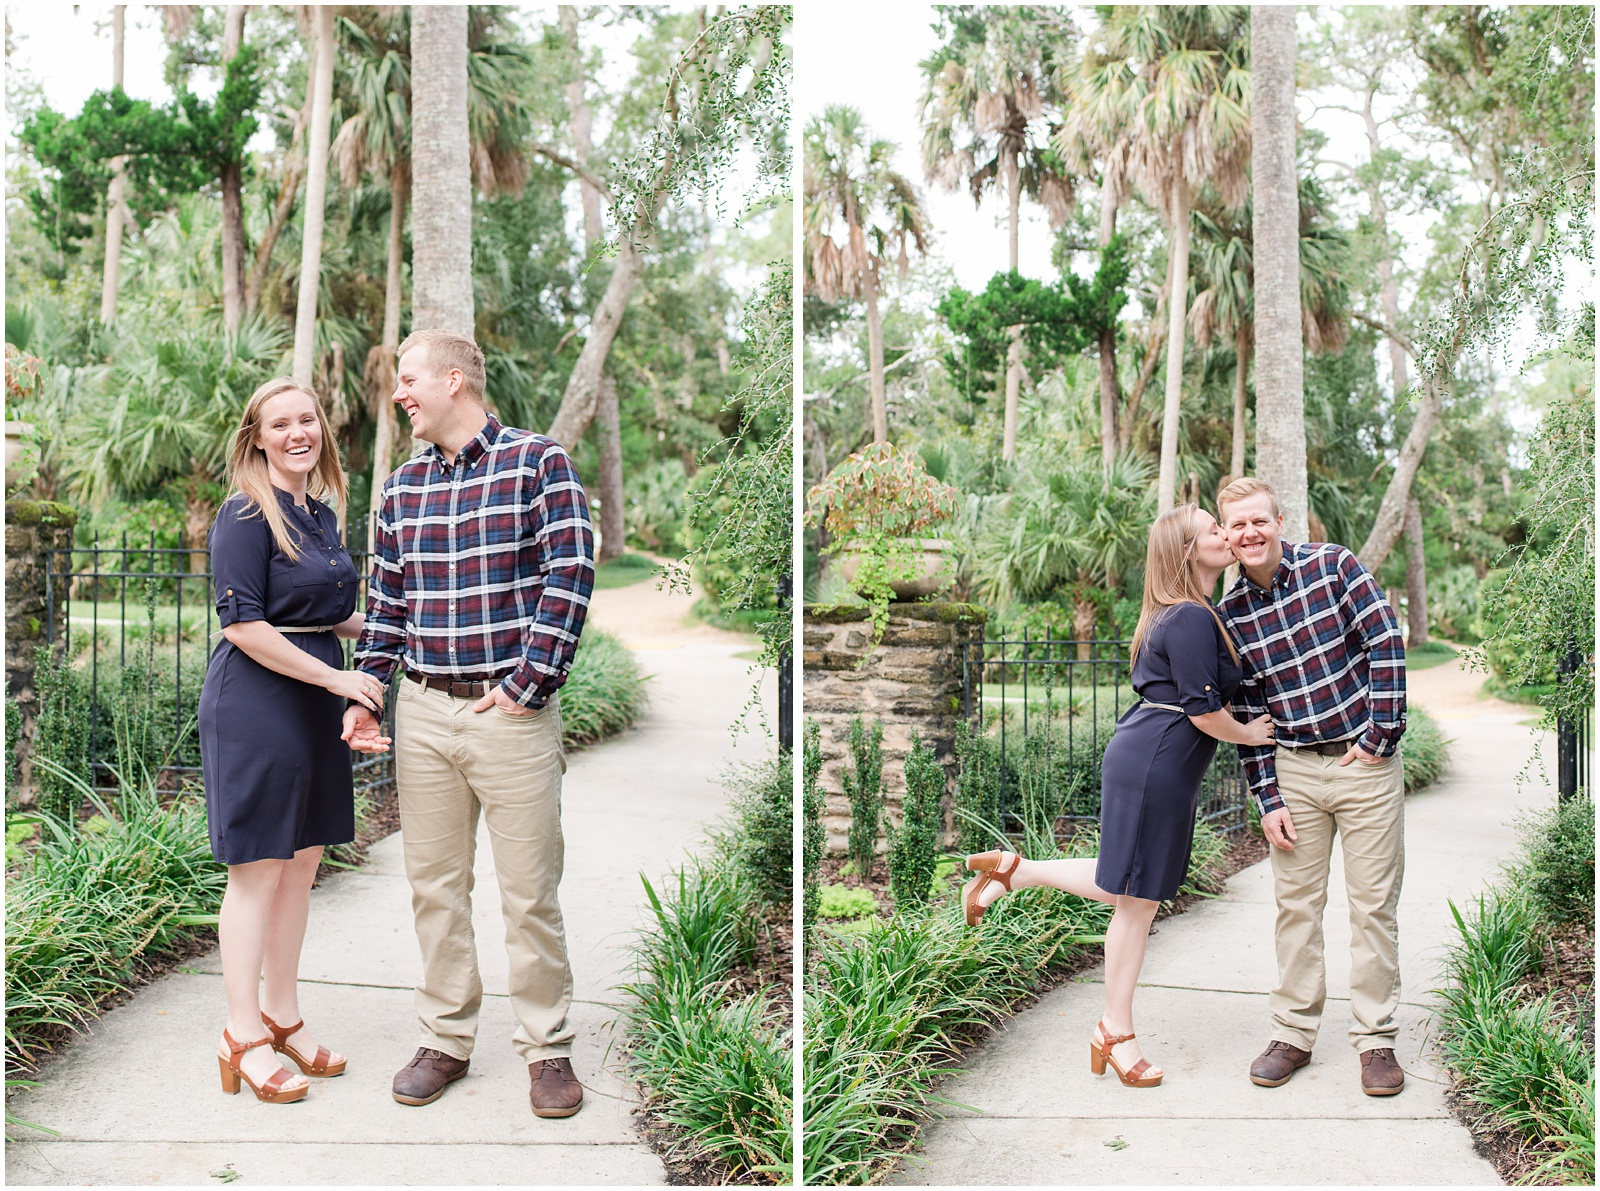 Palm Coast_Washington Oaks Garden_State Park_Engagement_Portraits_14.jpg